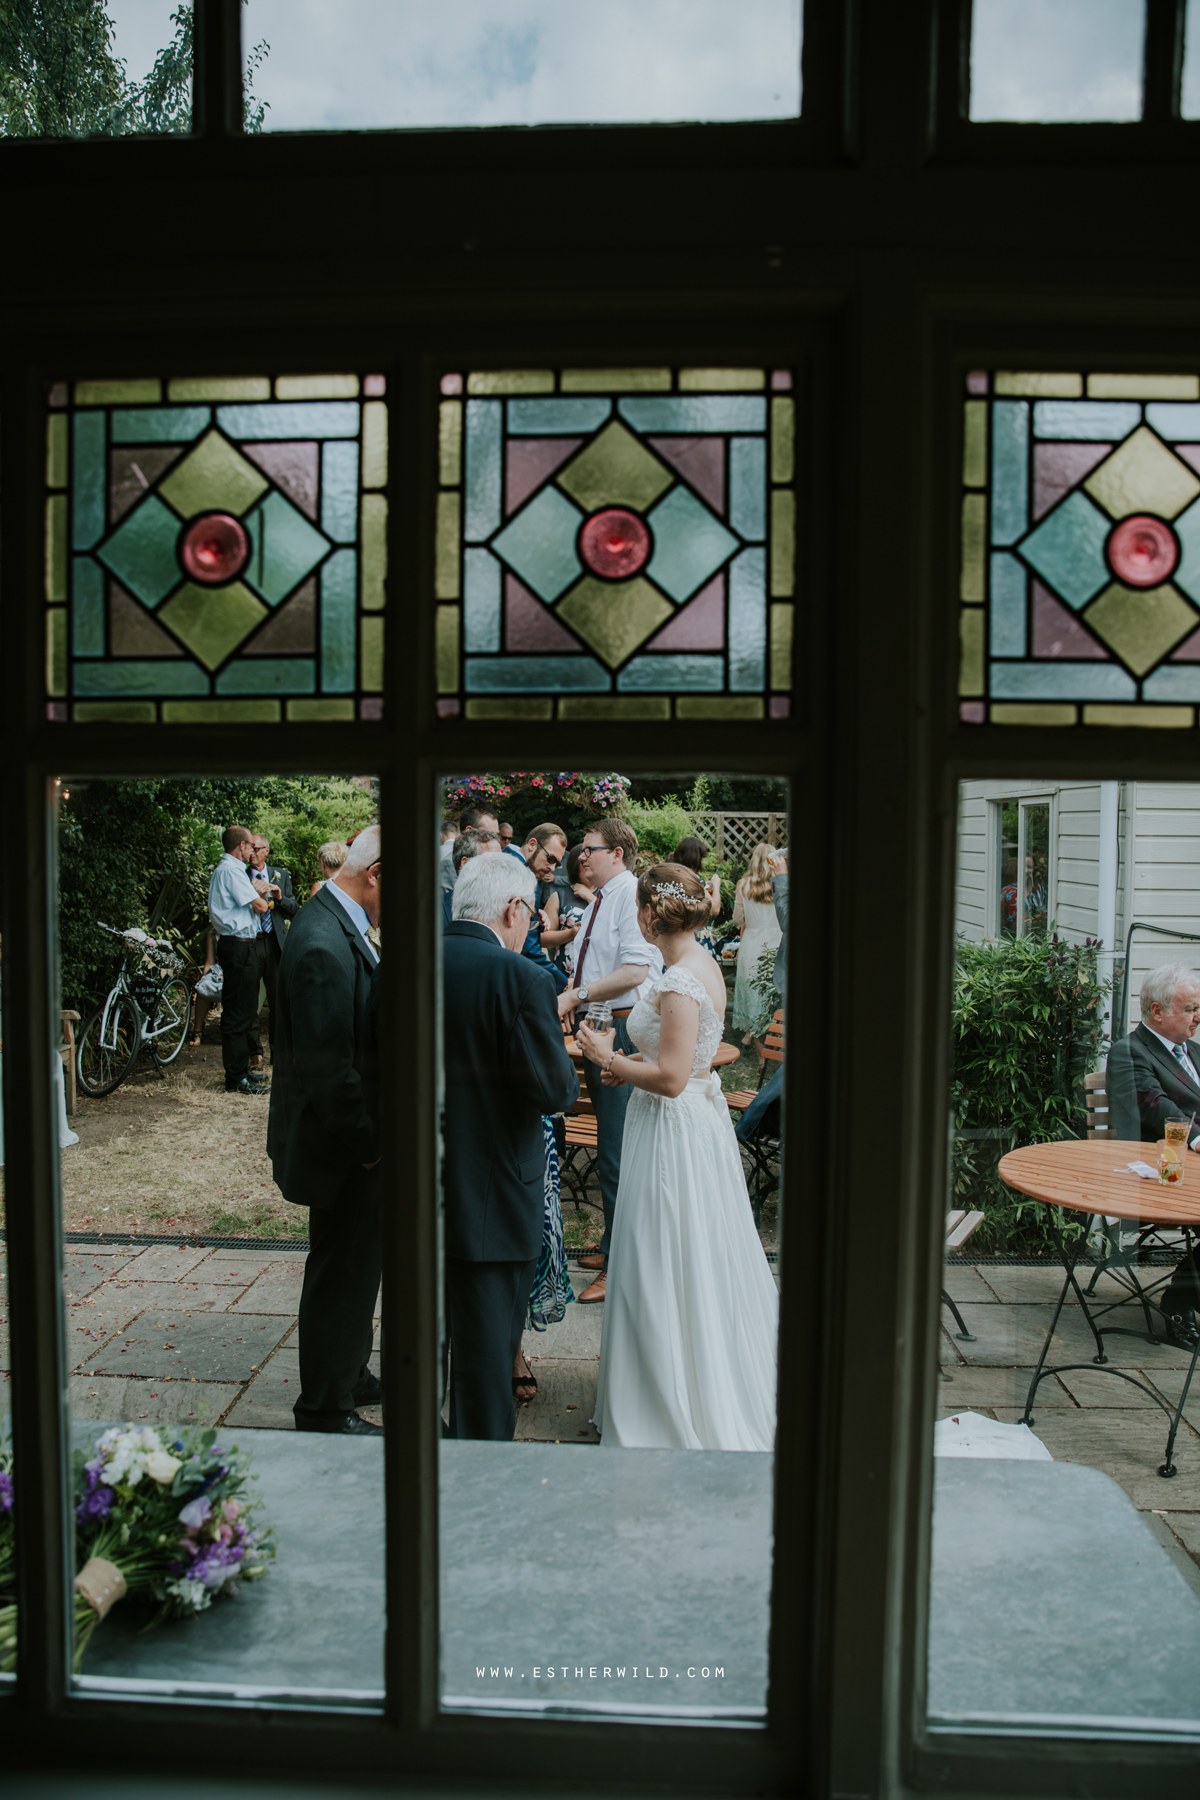 The_Georgian_Townhouse_Wedding_Norwich_Esther_Wild_Photographer_3R8A1440.jpg